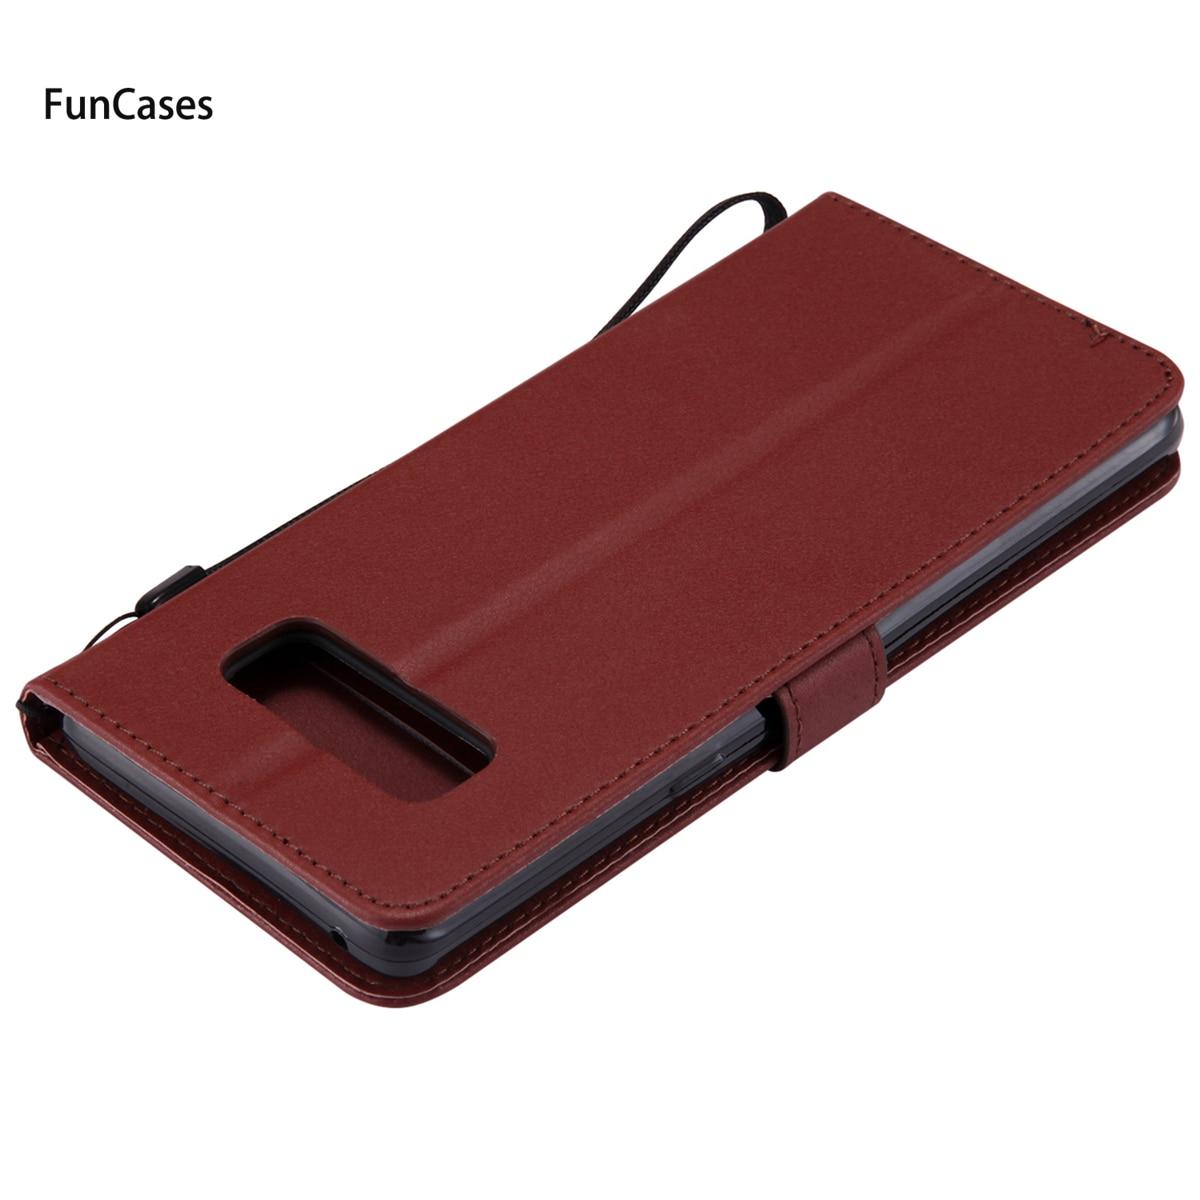 Luxurious PU Leather Case sFor Capa Samsung Note 8 Soft Silicone Phone Case Aksesuar PU Leather Case Samsung Galaxy Note 8